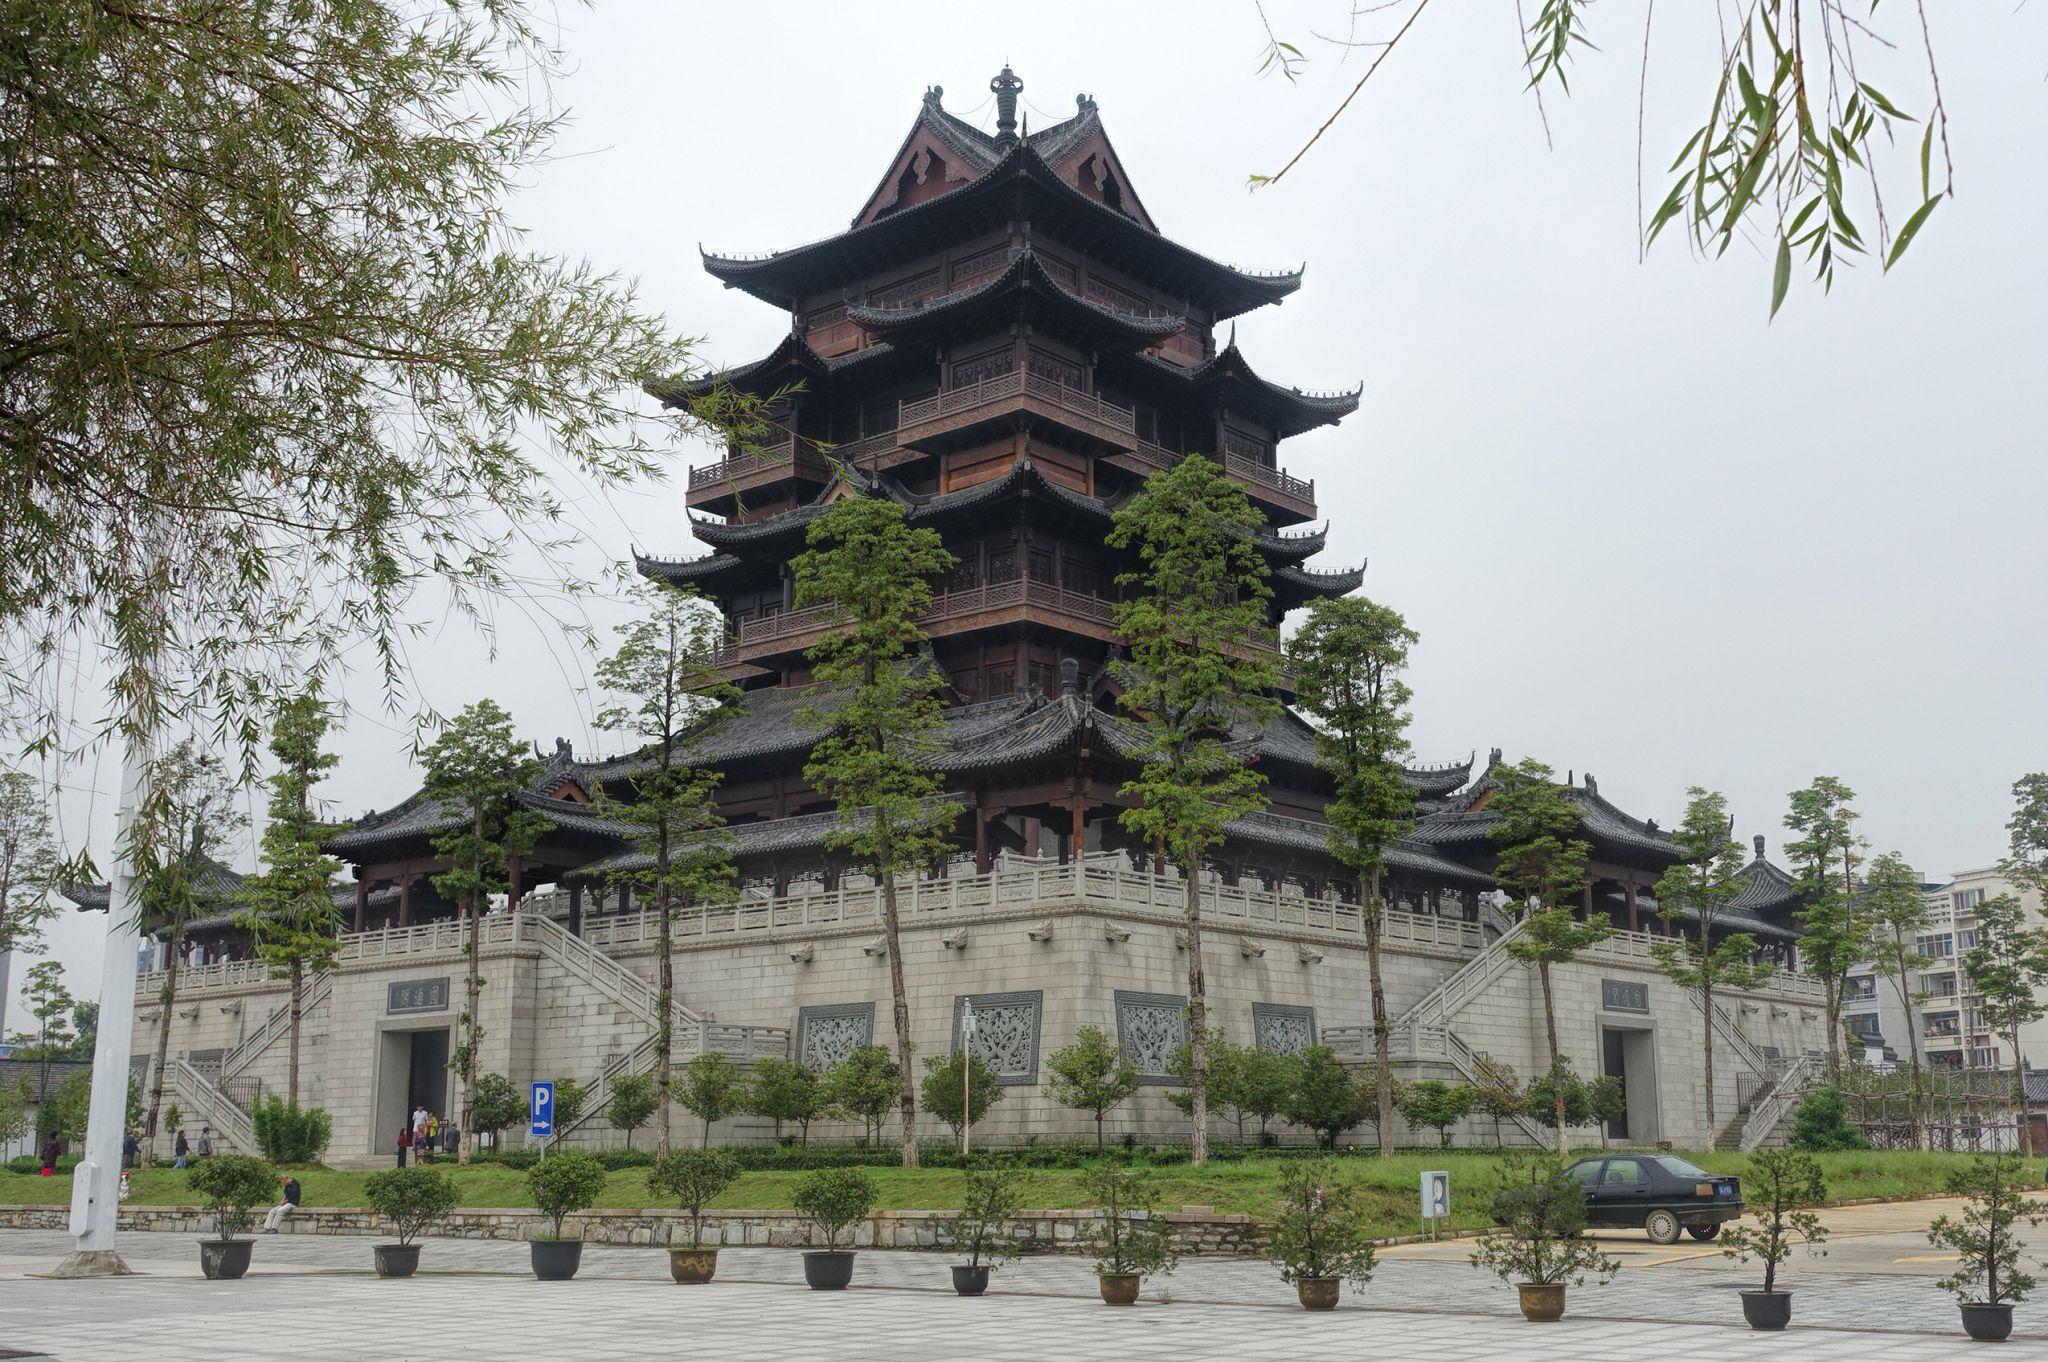 Guiyuan Buddhist Temple, Wuhan, China